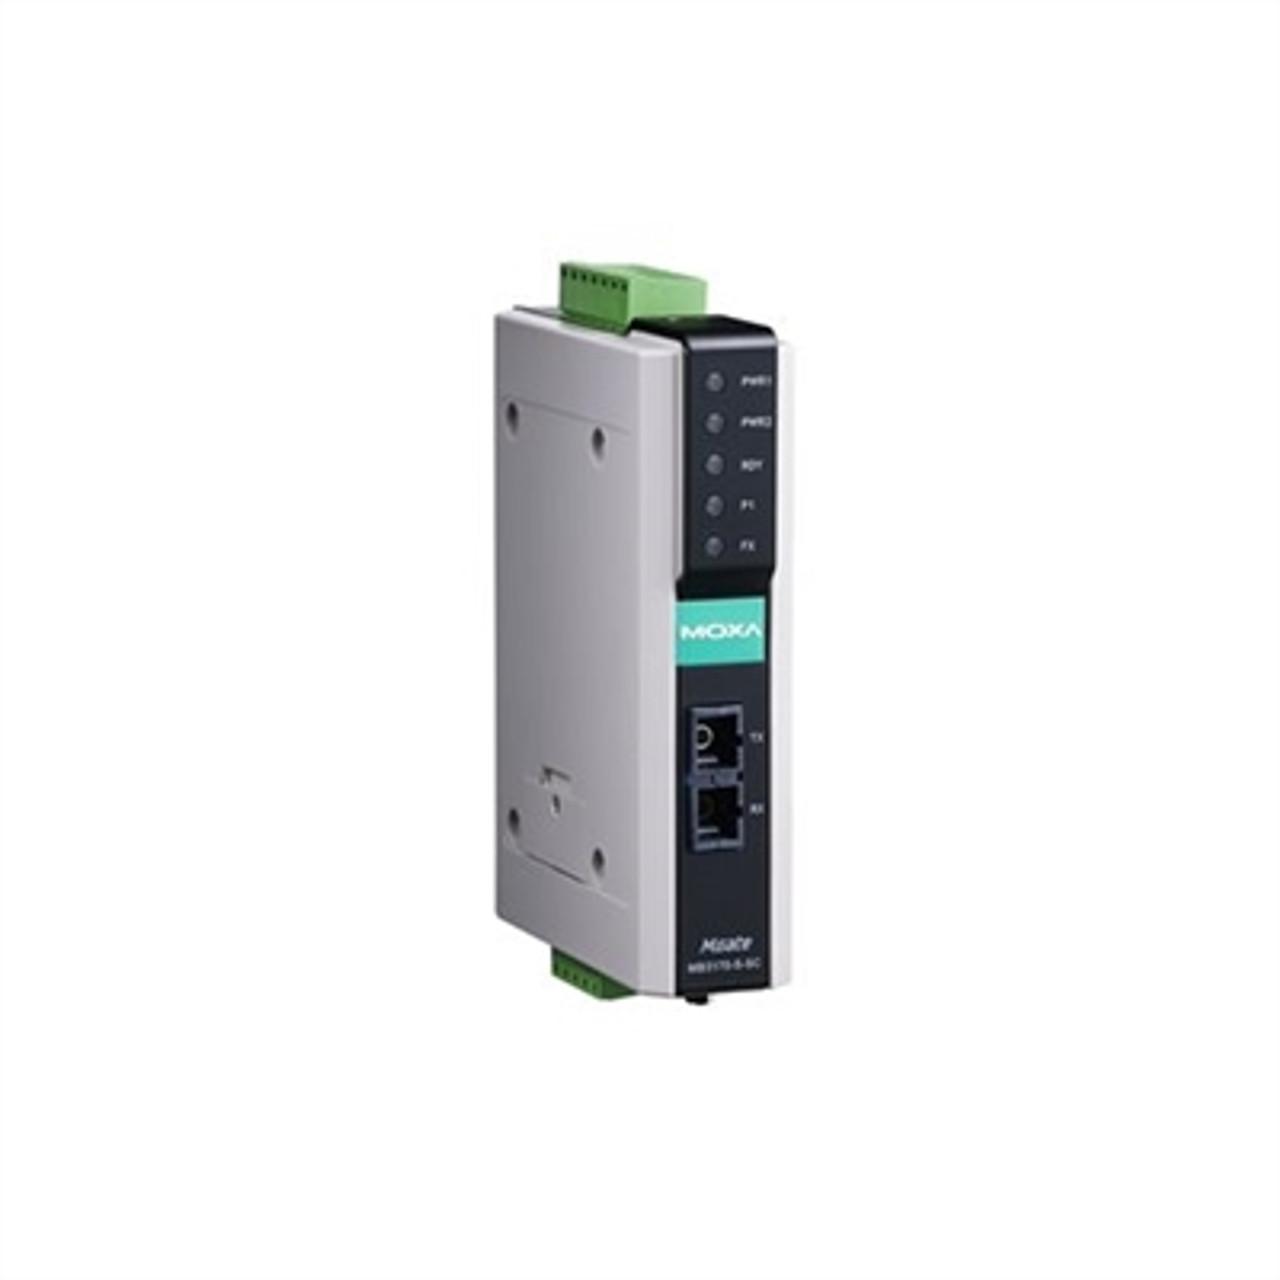 Moxa MGate MB3170I-M-SC 1-Port Advanced Modbus Gateway